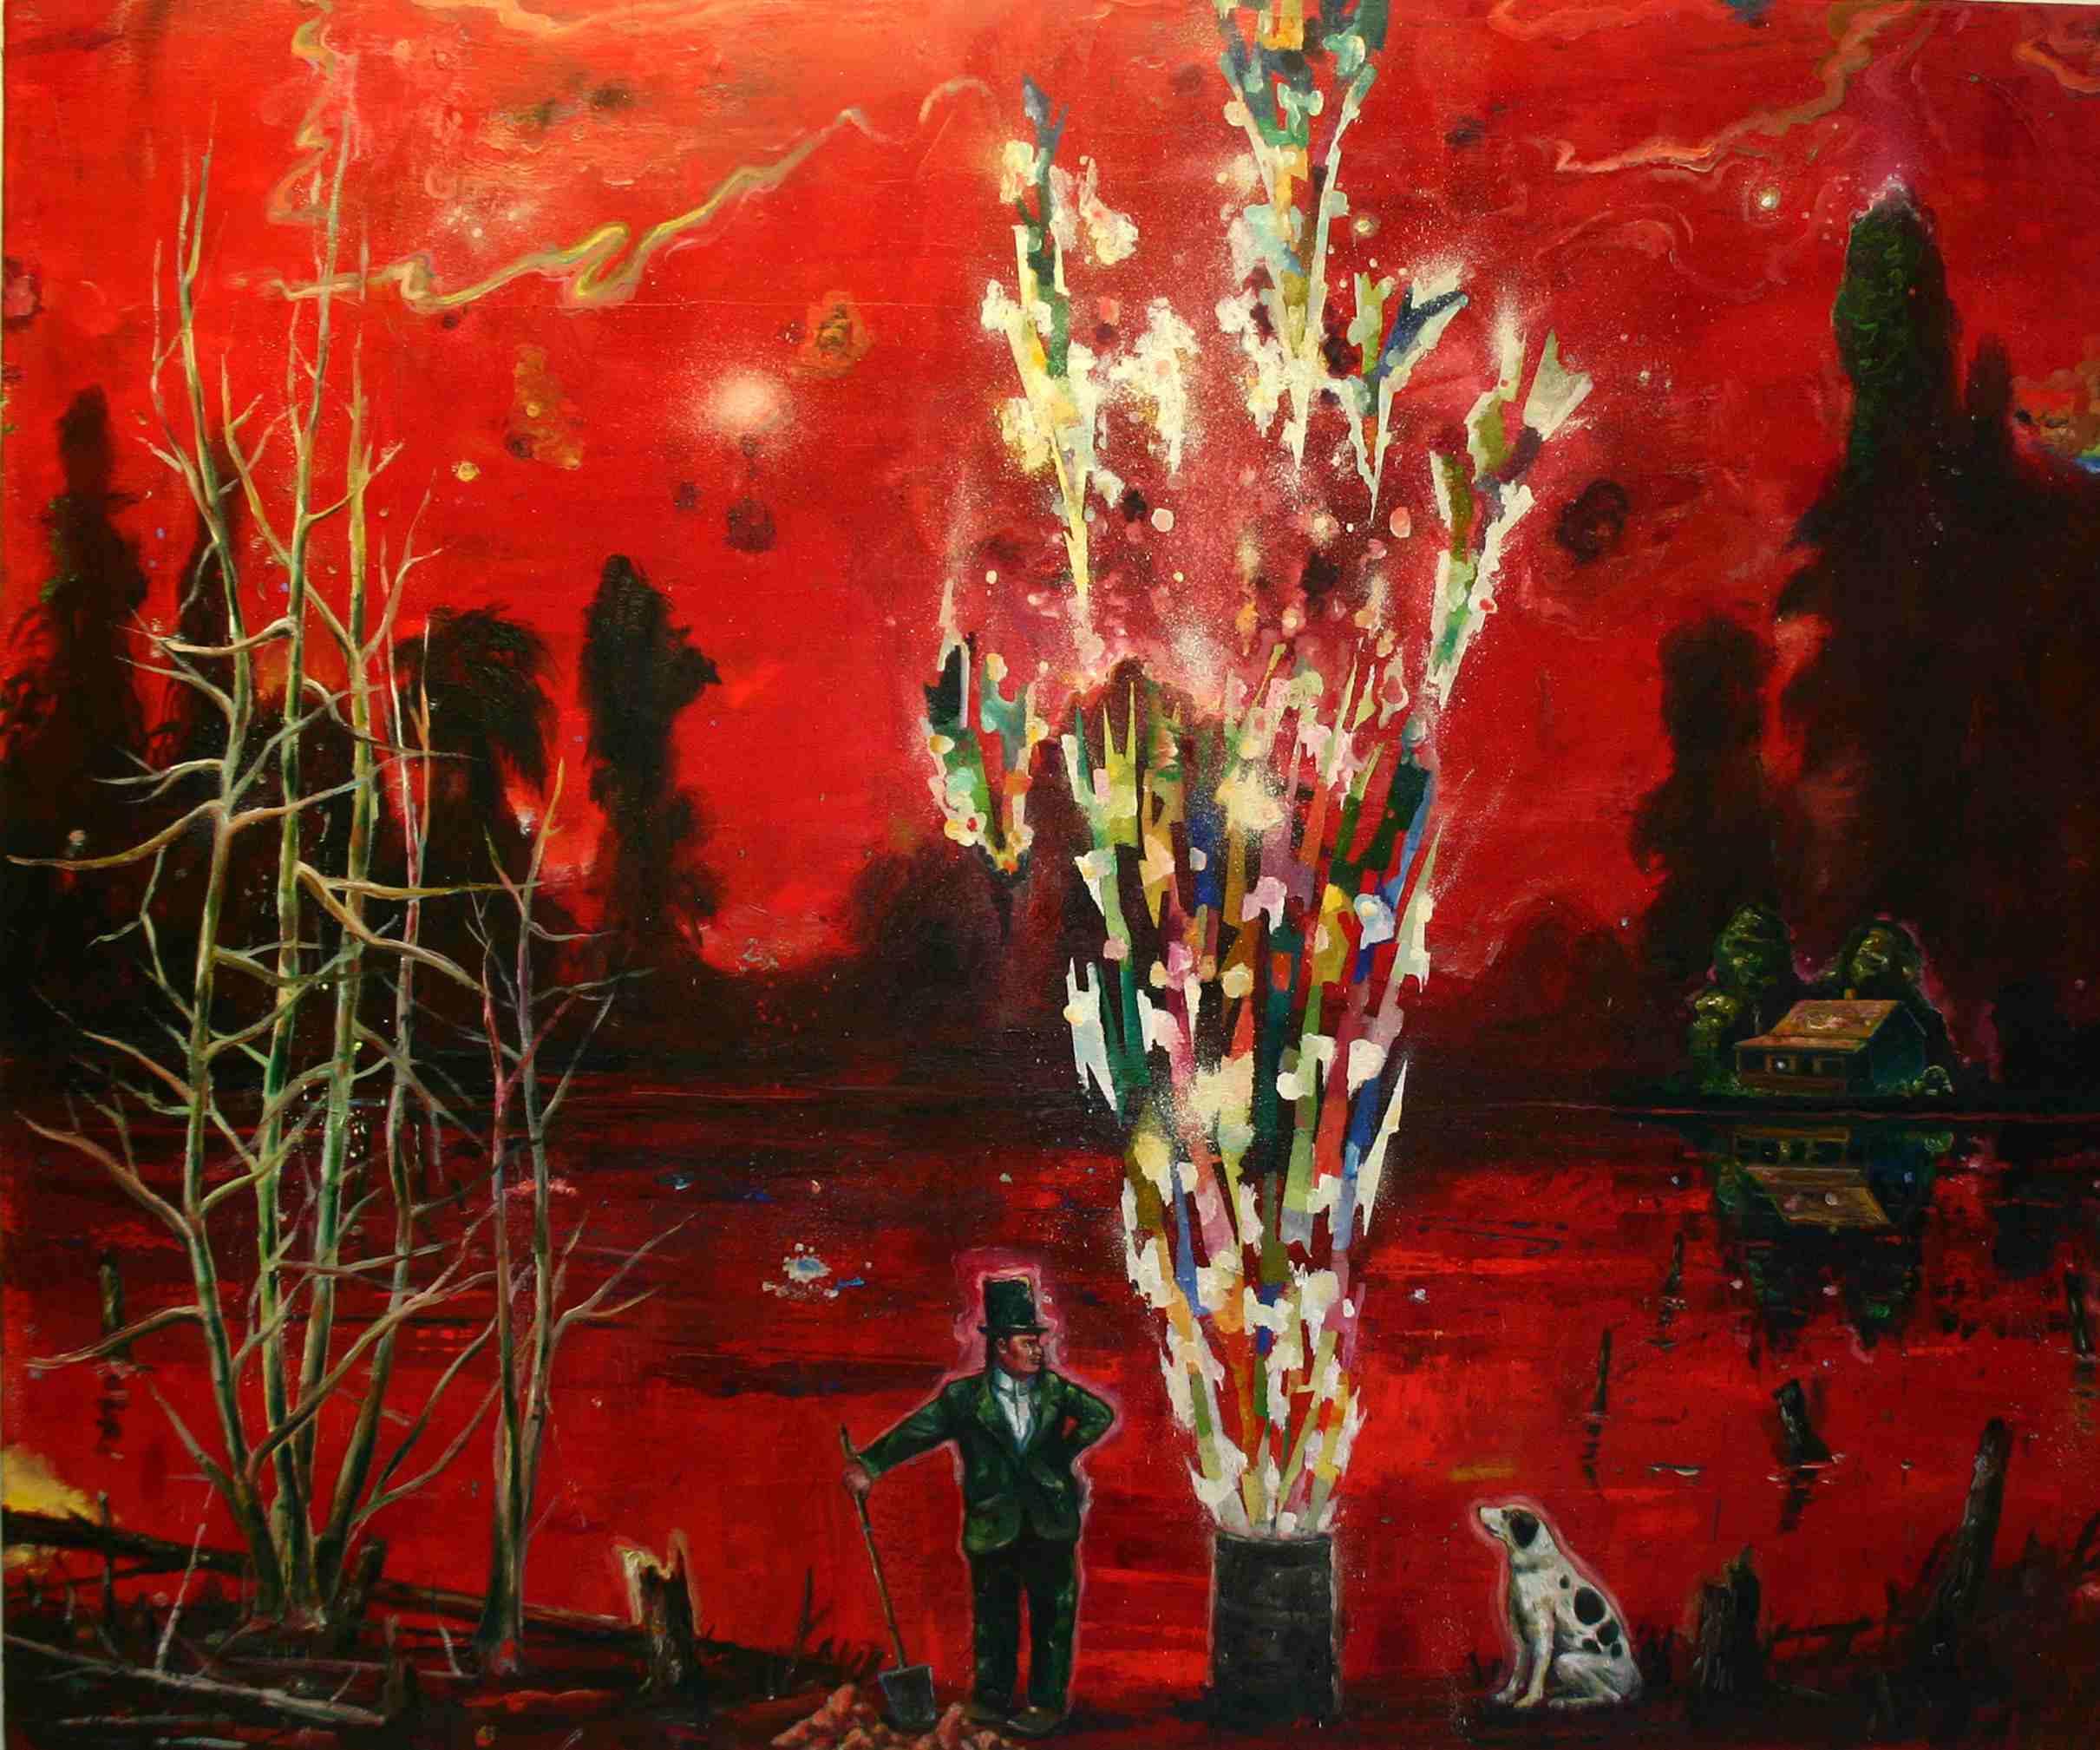 Olle Schmidt, Treasure Hunt II, 2015, oil on canvas, 120 x 145 cm